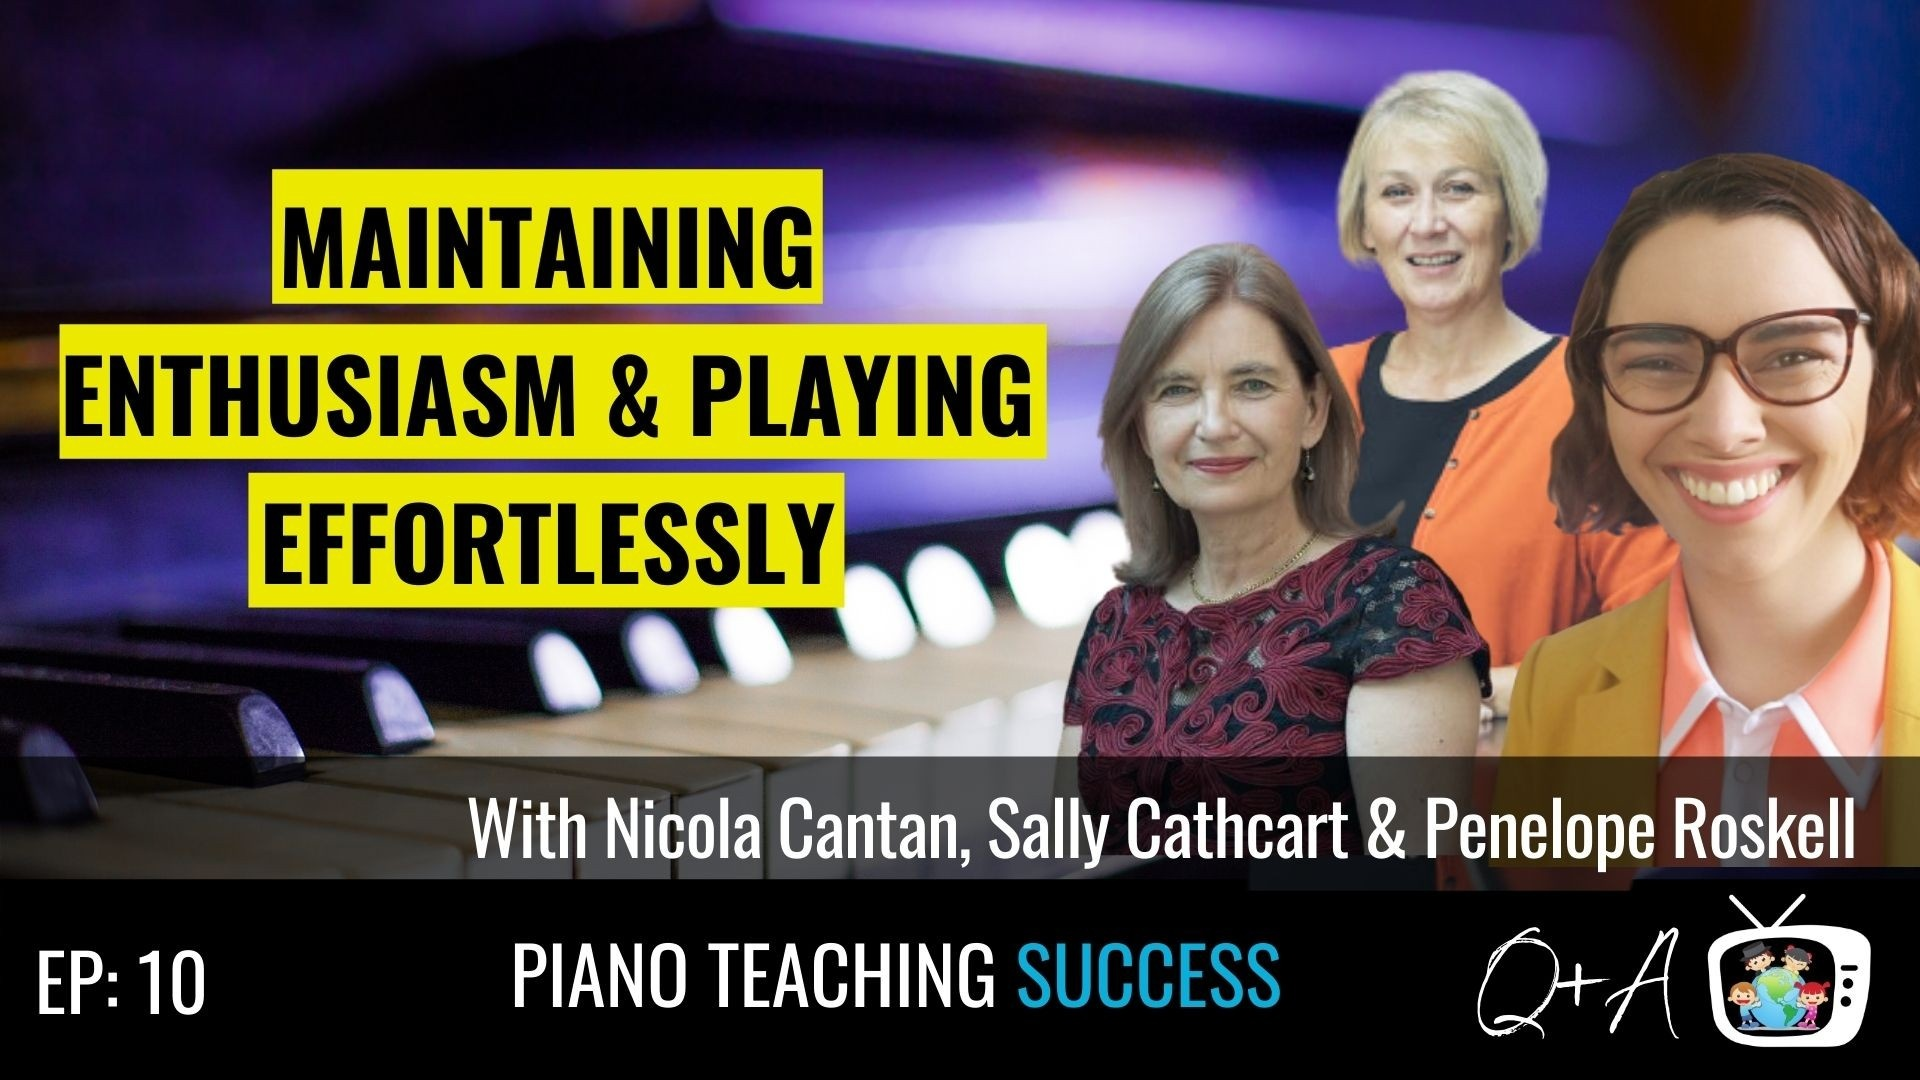 Nicola Cantan, Sally Cathcart, Penelope Roskell